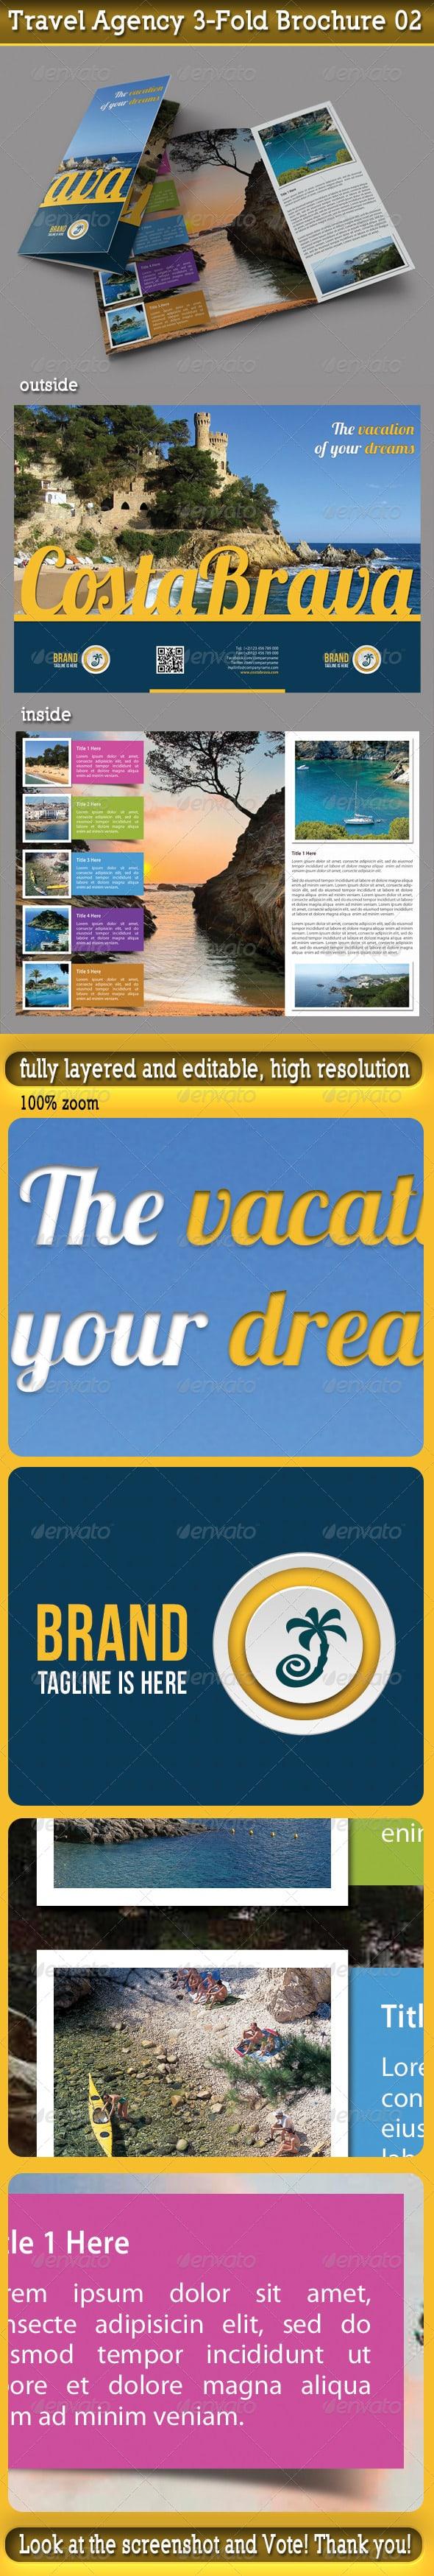 Travel Agency 3-Fold Brochure